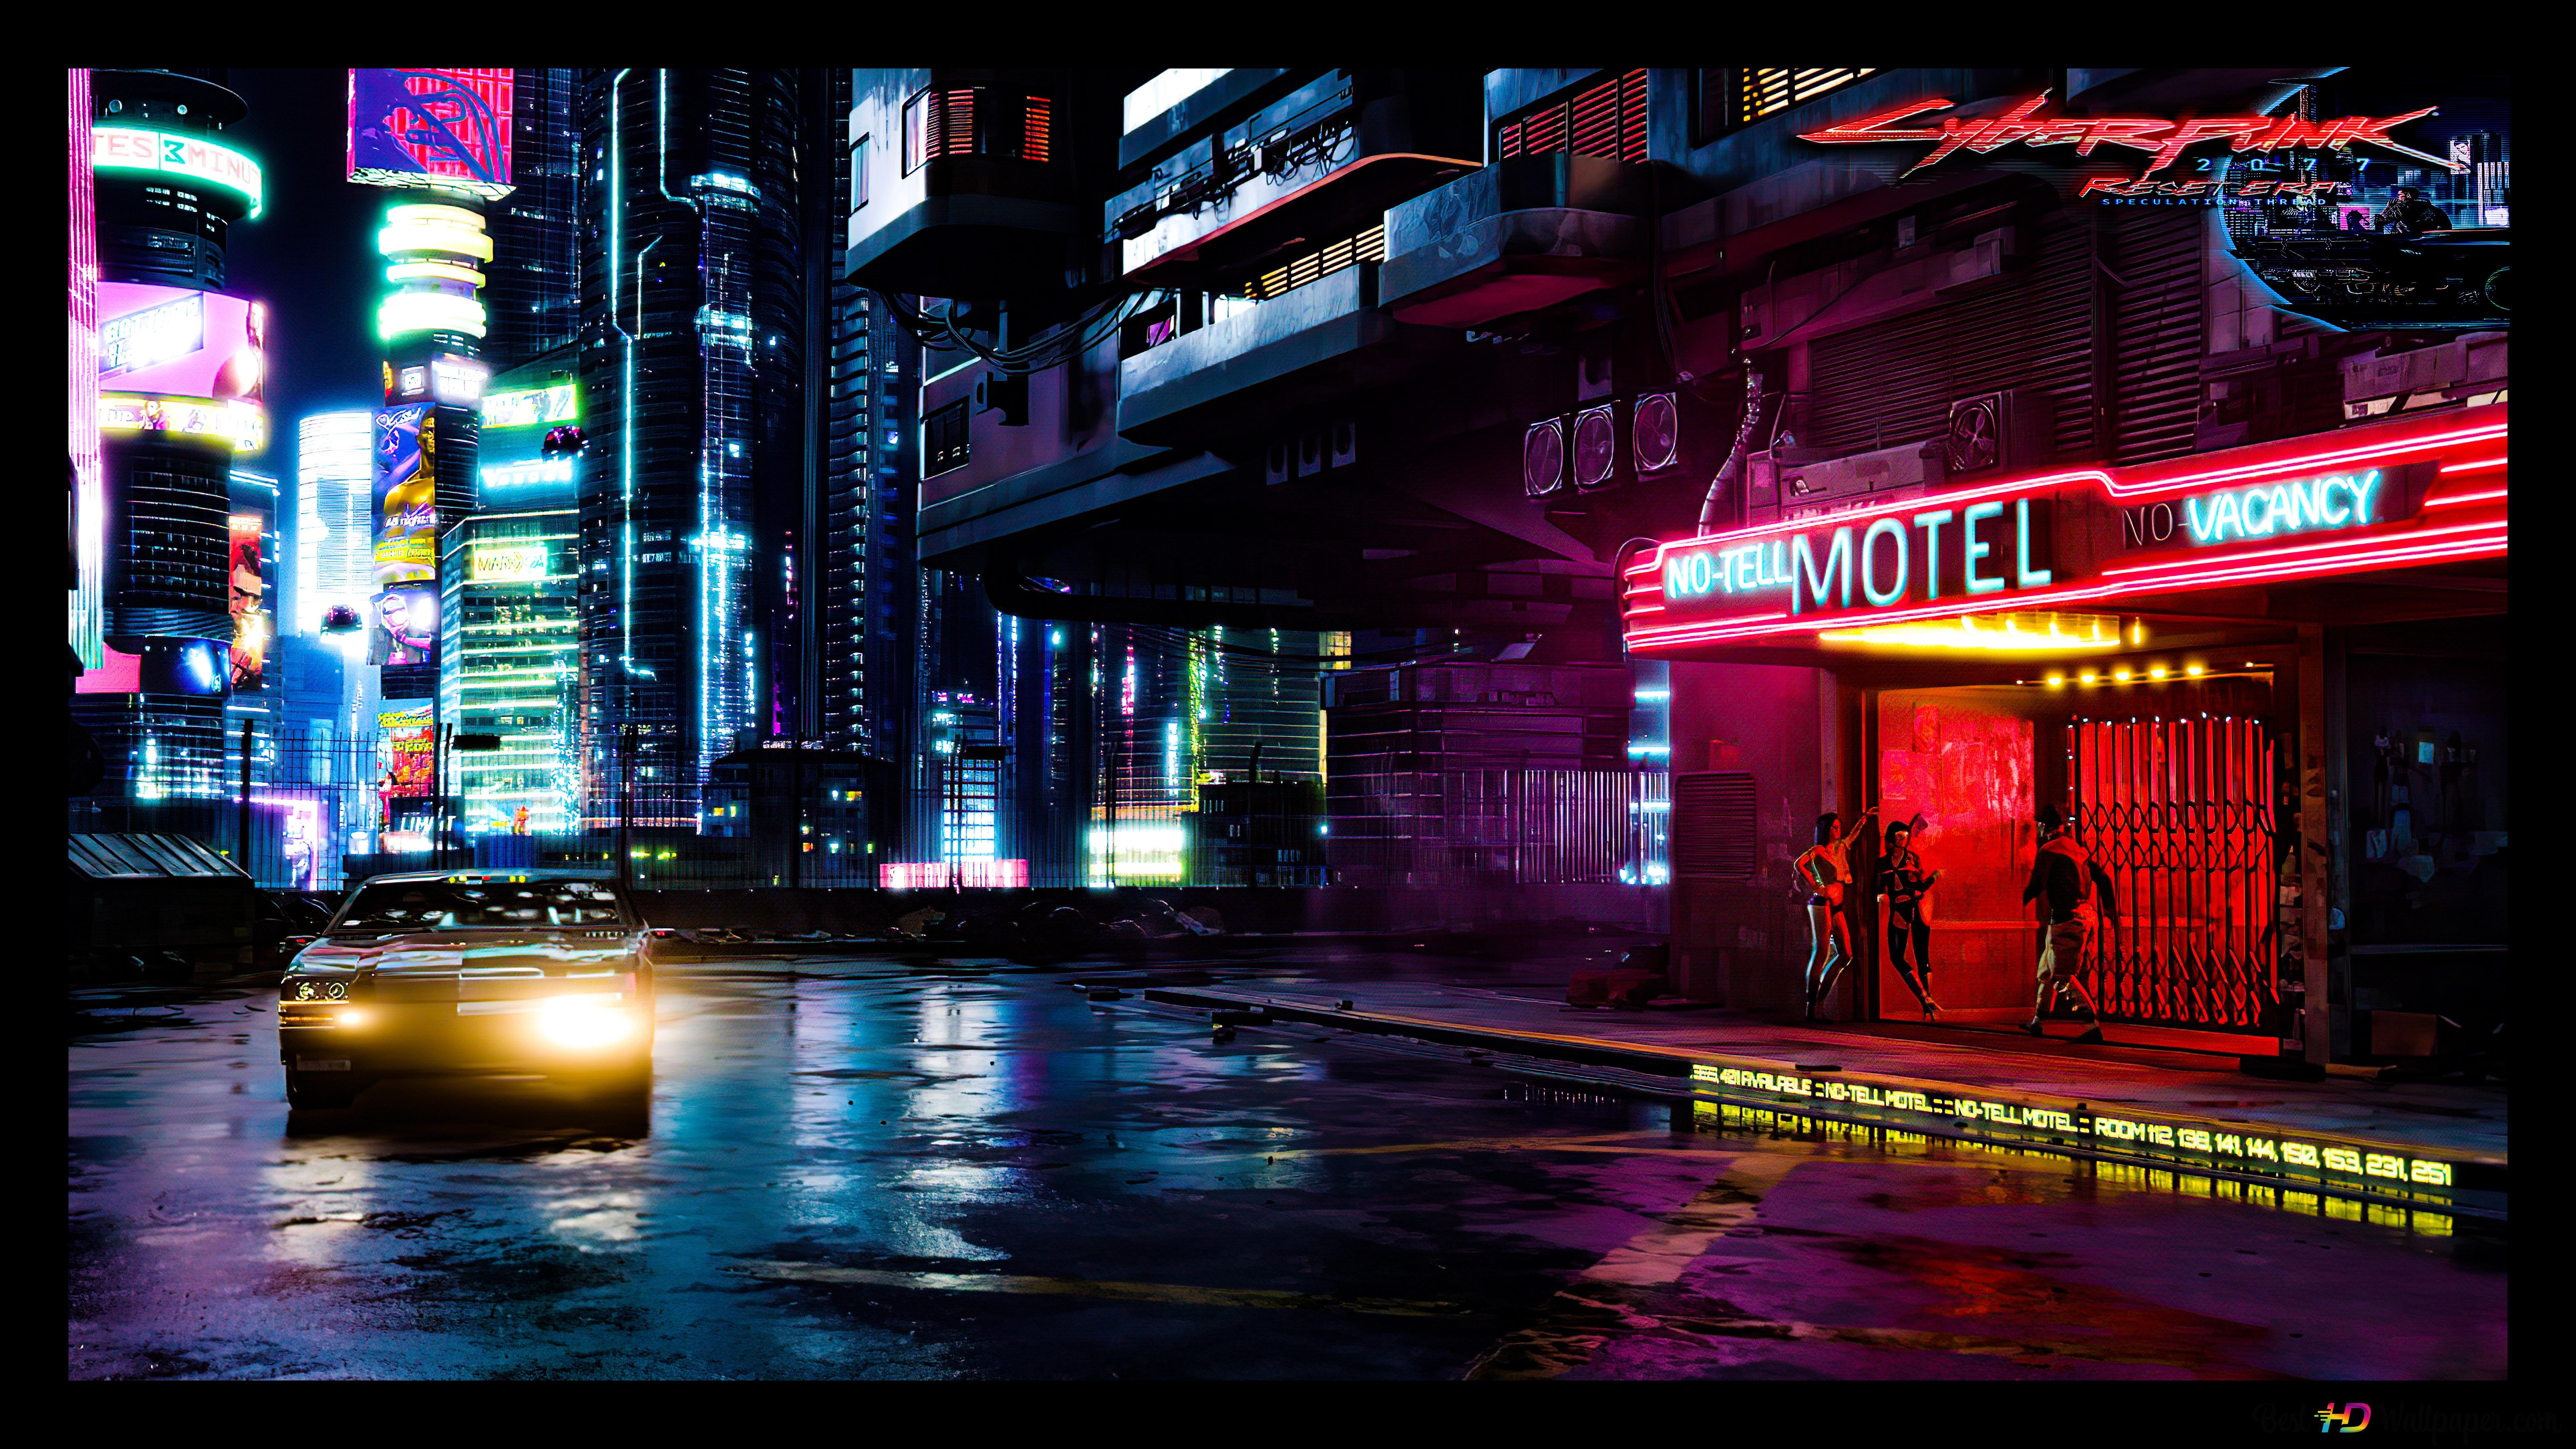 Cyberpunk 2077 City 8k 4k Hd Wallpaper Download